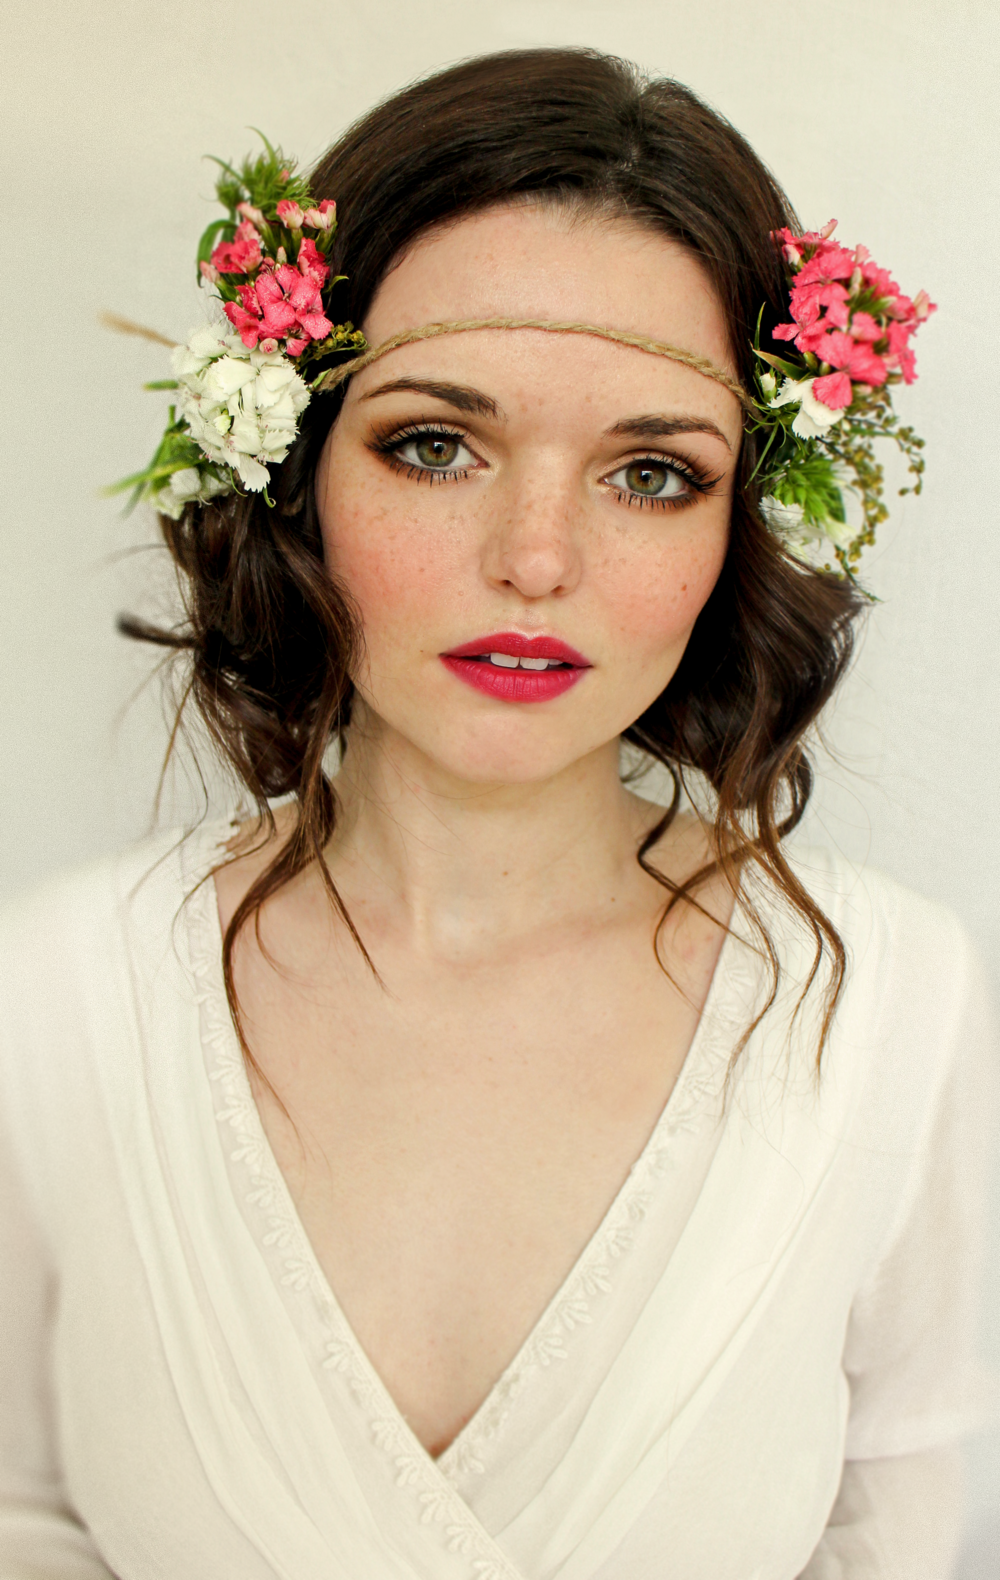 jodi pink flowers bridal hair and mKEUP.png